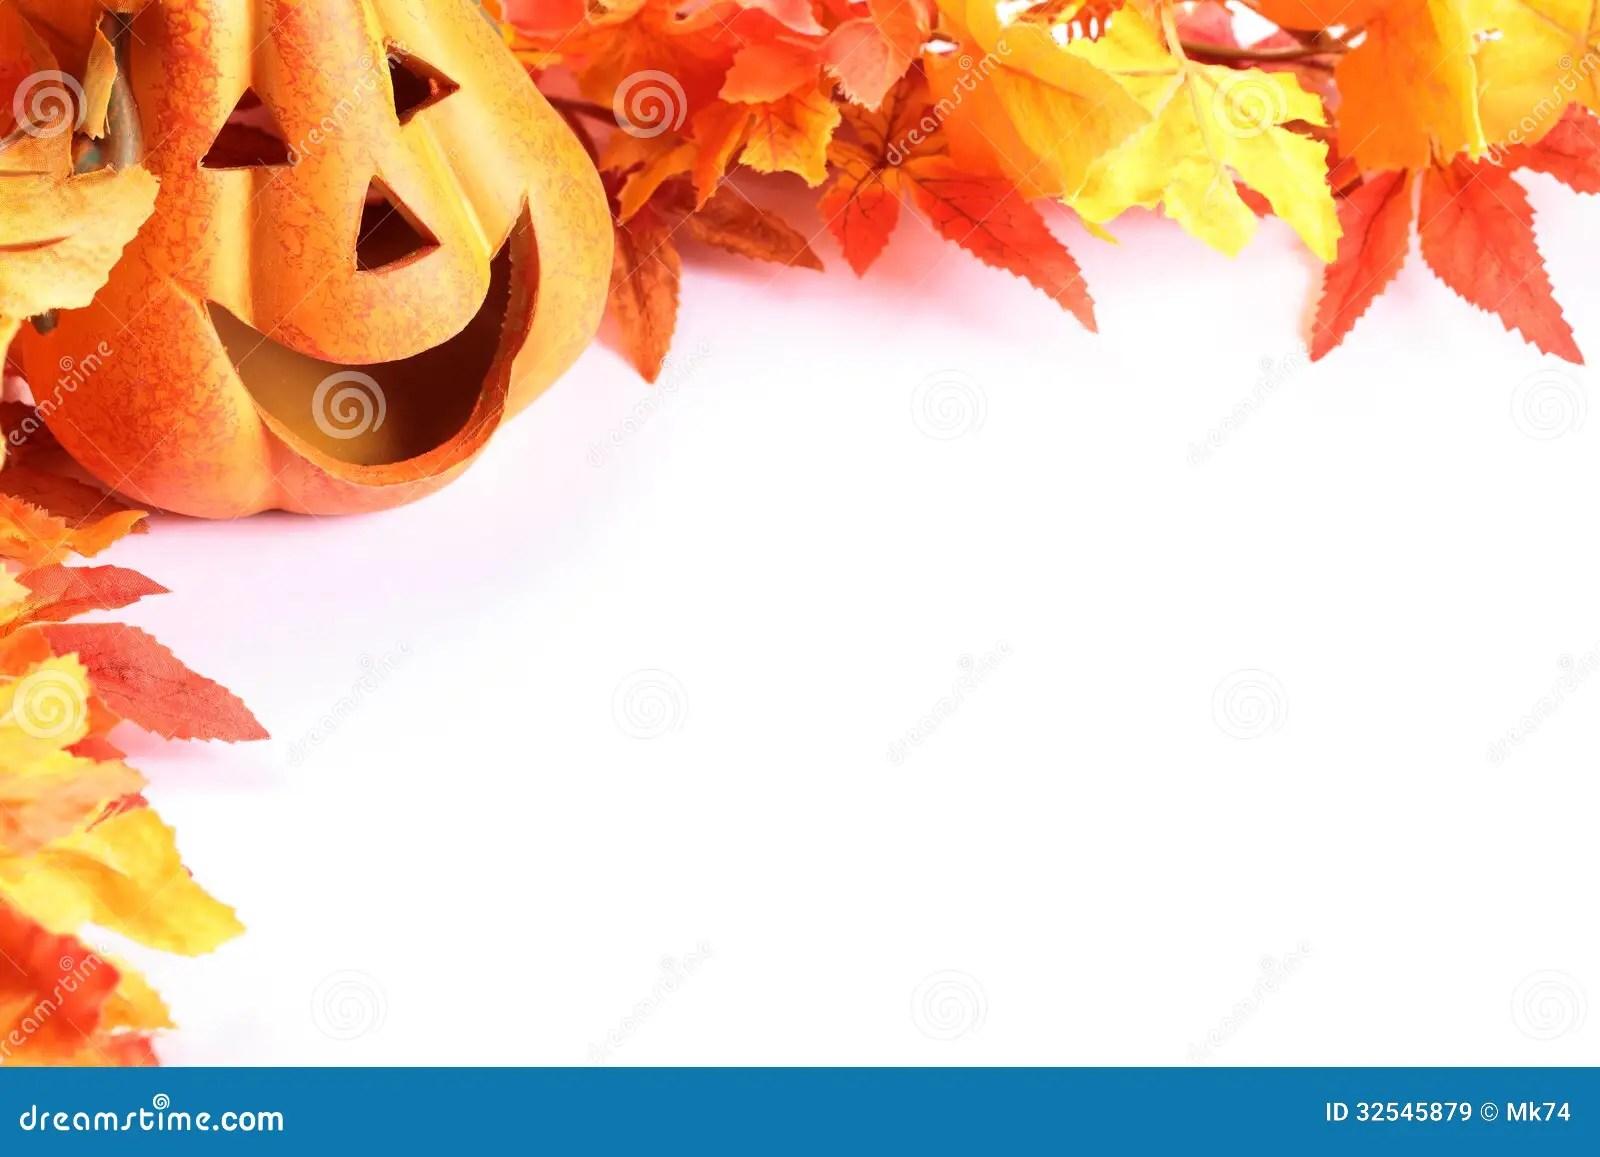 Free Fall Pumpkin Wallpaper Halloween Background Stock Image Image Of Decoration